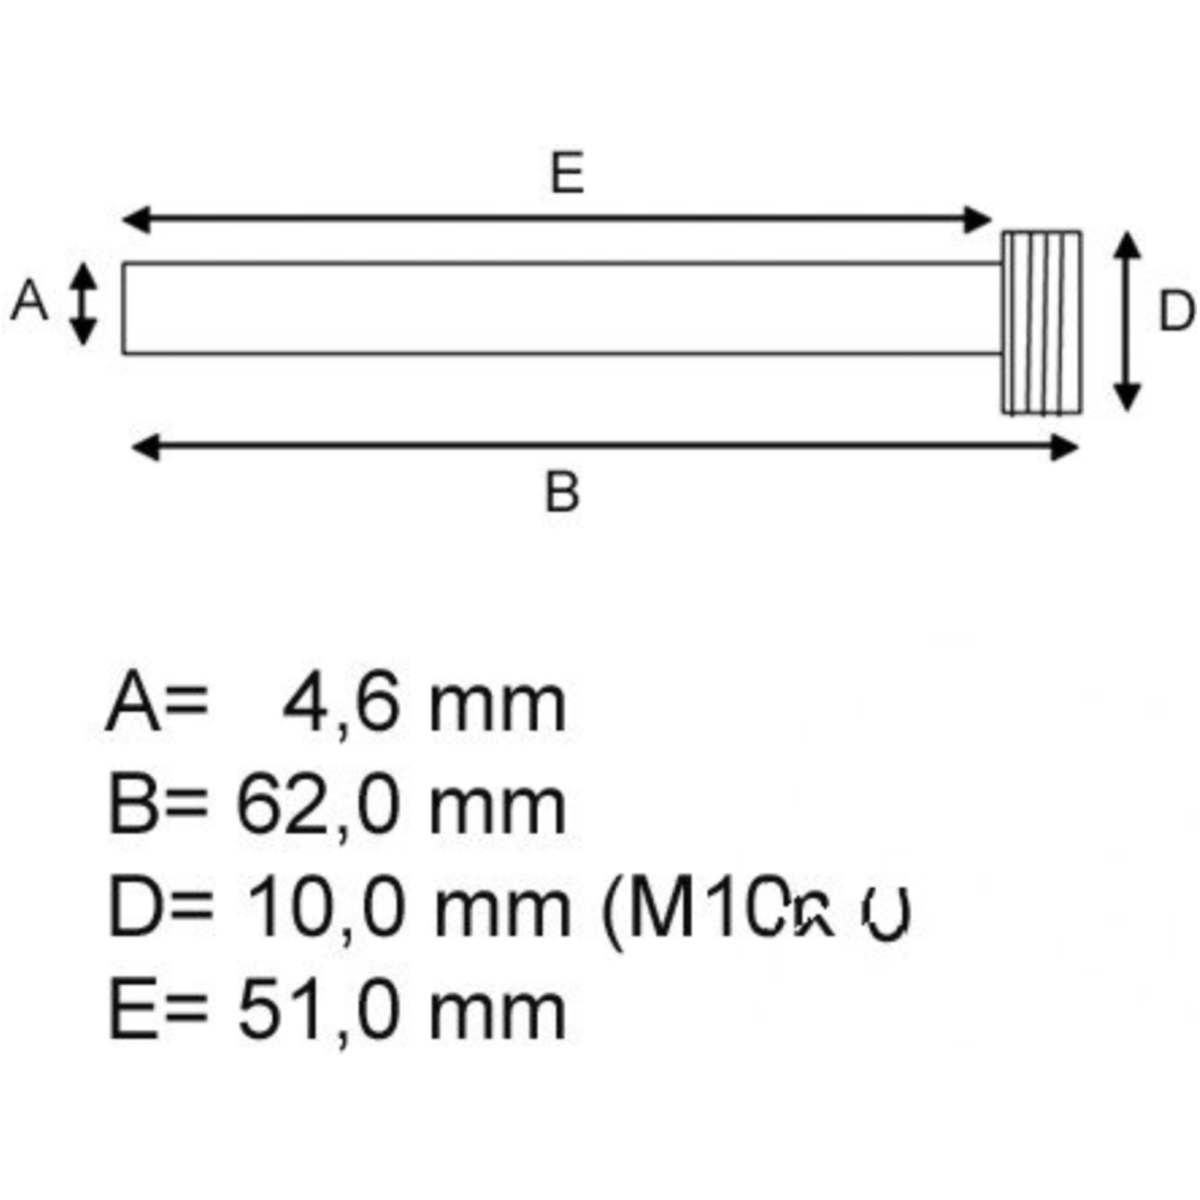 Pad pin pps912 honda vfr 17980 technical data sciox Images